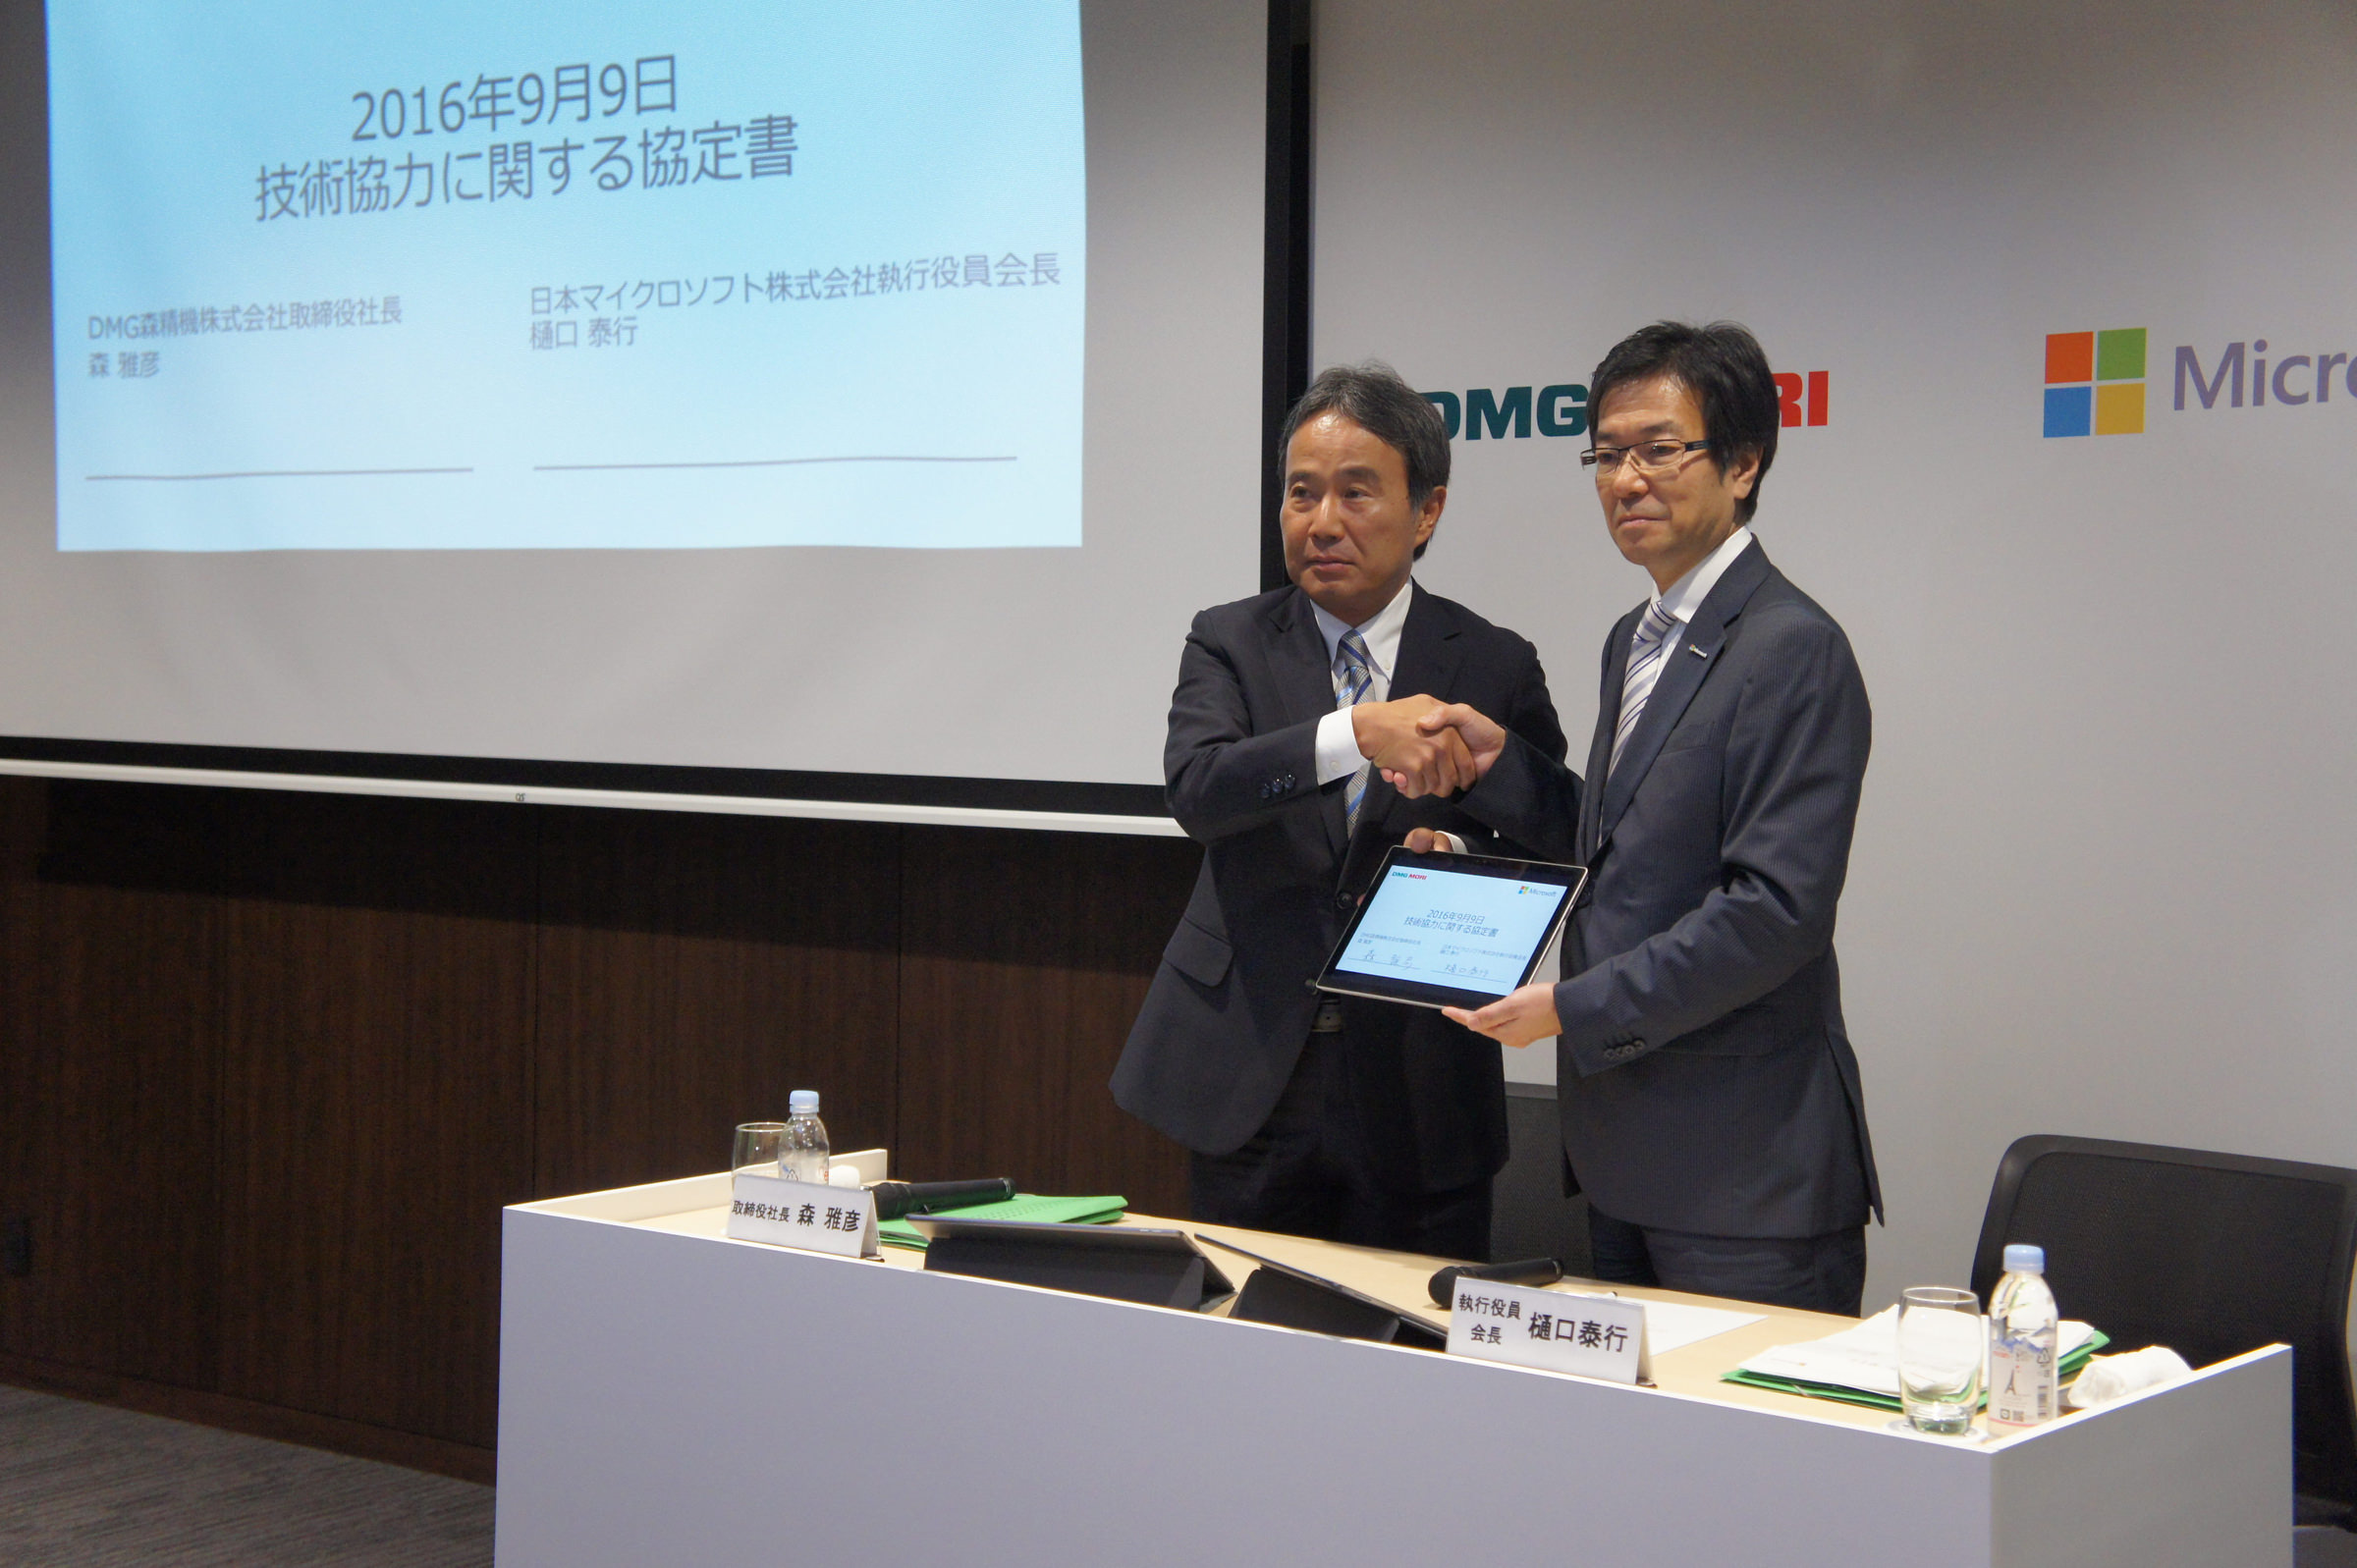 DMG森精機と日本マイクロソフト スマートファクトリー実現へ セキュリティ対策で技術協力